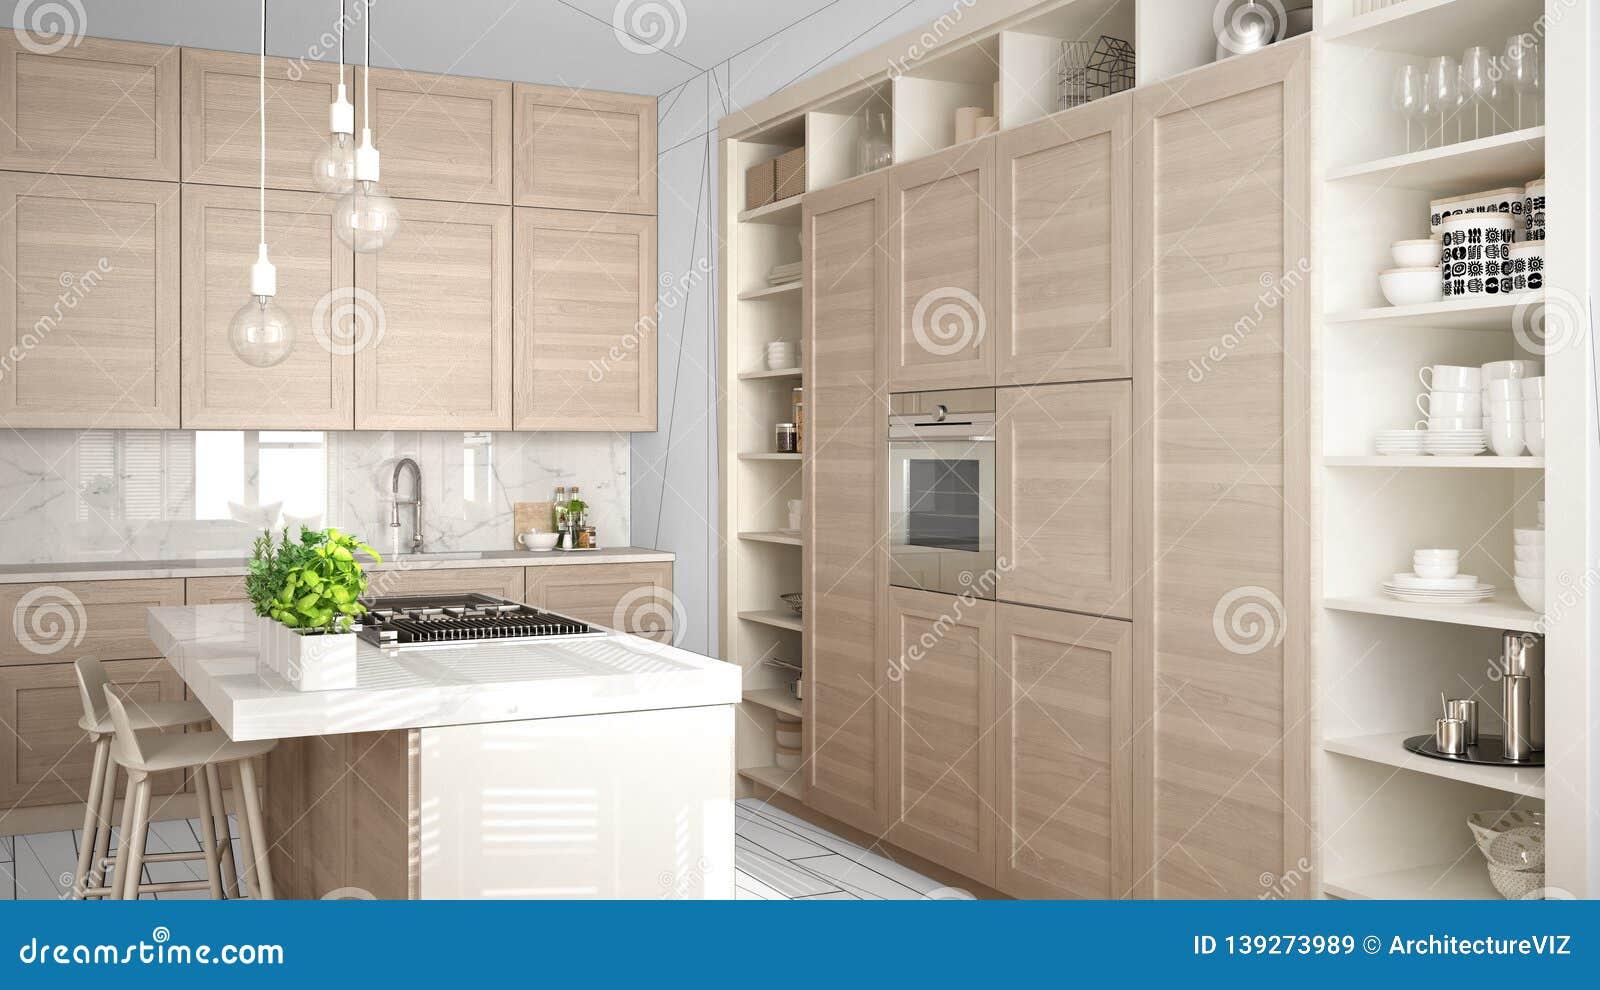 Modern White Kitchen With Wooden Details In Contemporary Luxury